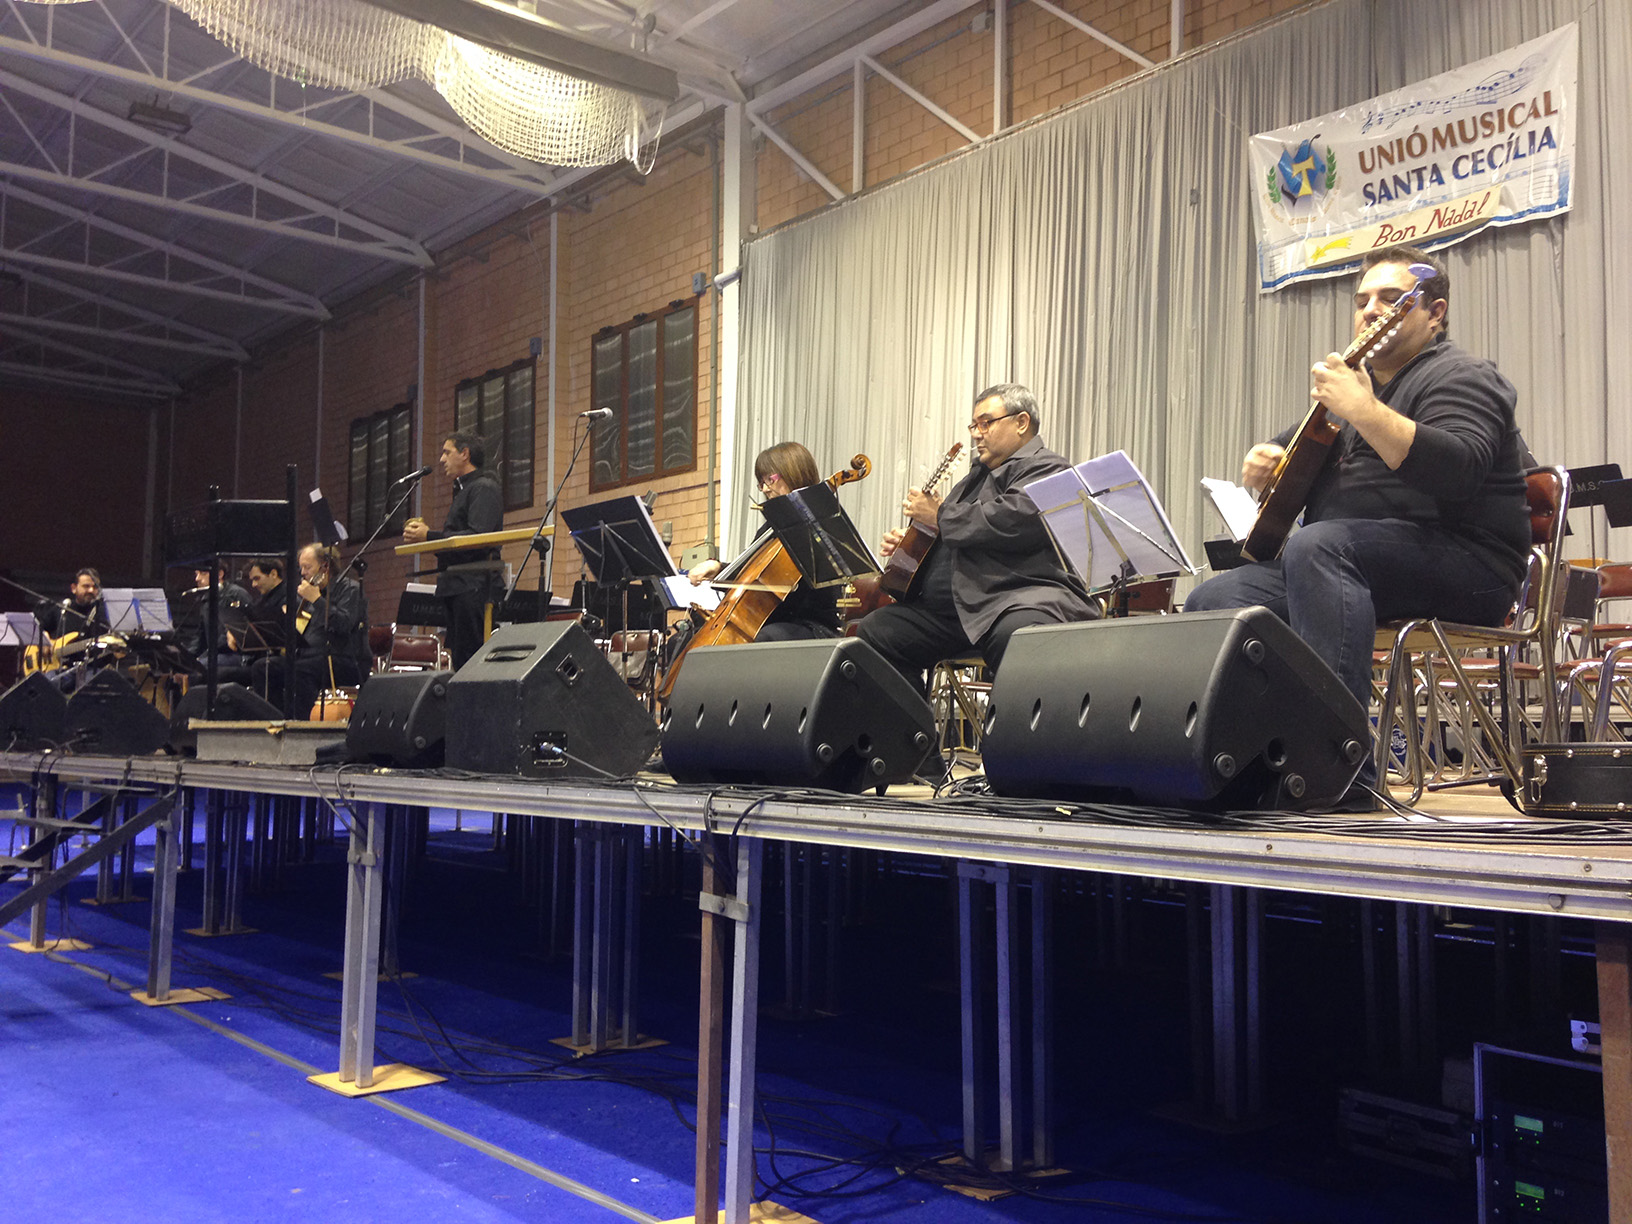 2014-12-21 Disc Botifarra-Ja Ve Nadal a Canals (35)